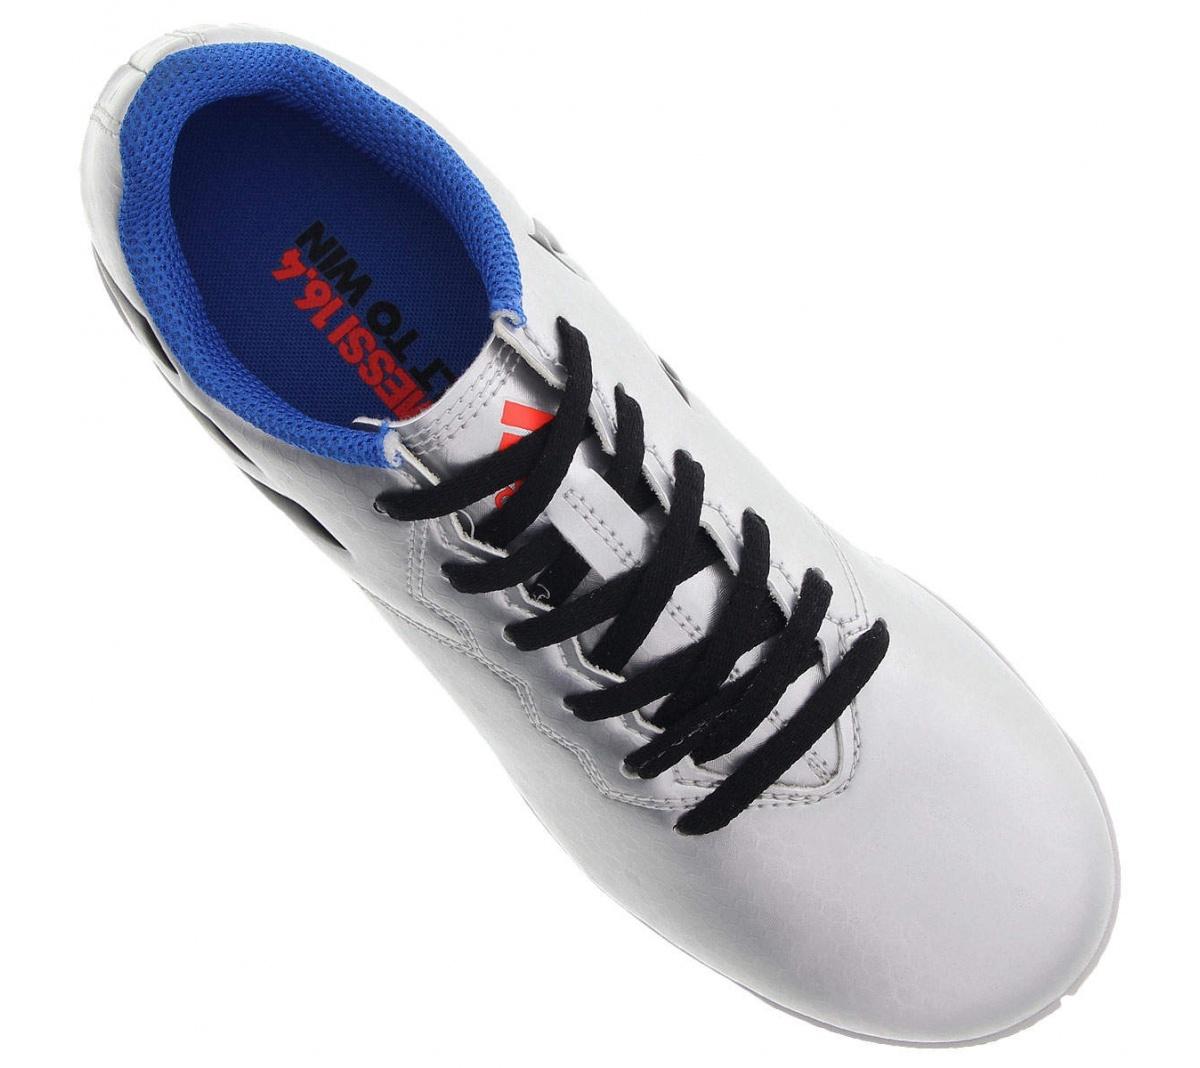 Tênis Adidas Messi 16.4 Futsal JR - Mundo do Futebol 8c368761c8be7